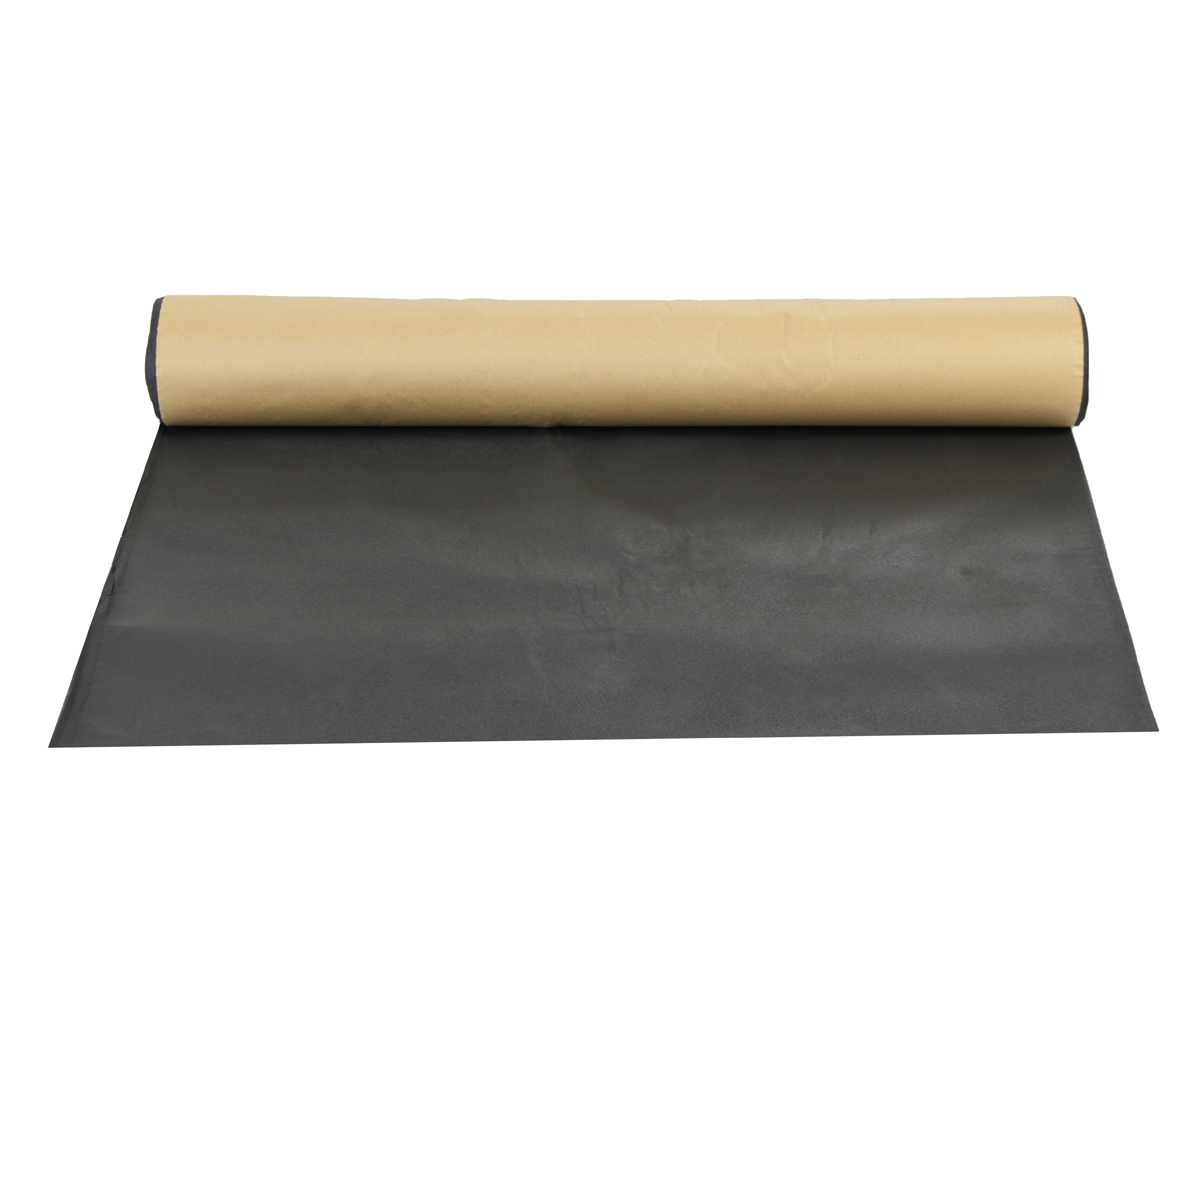 36 sqft Car Sound Deadening Mat Sound Deadener Insulation Acoustic Foam Material Interior Accessory Sound Heat Insulation Cotton ...